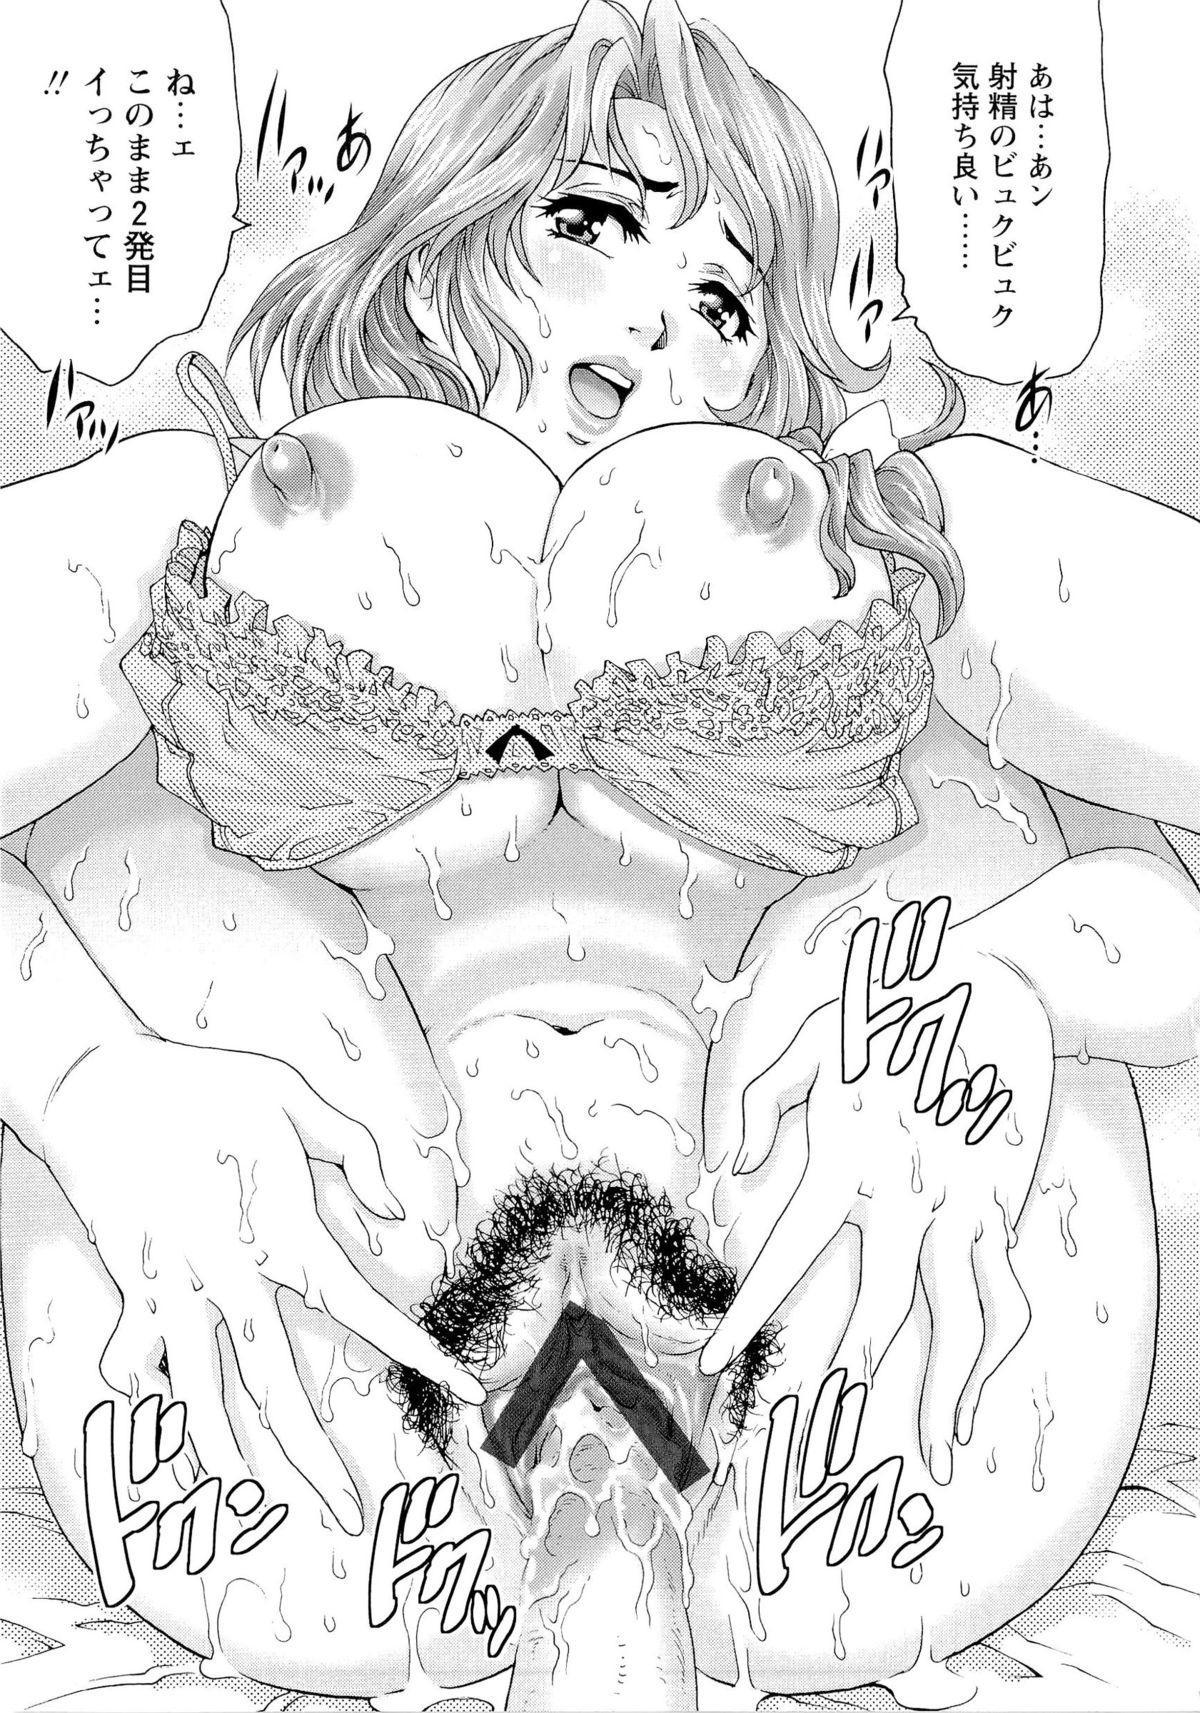 Nureteru Hitozuma - Wetly Wife 129